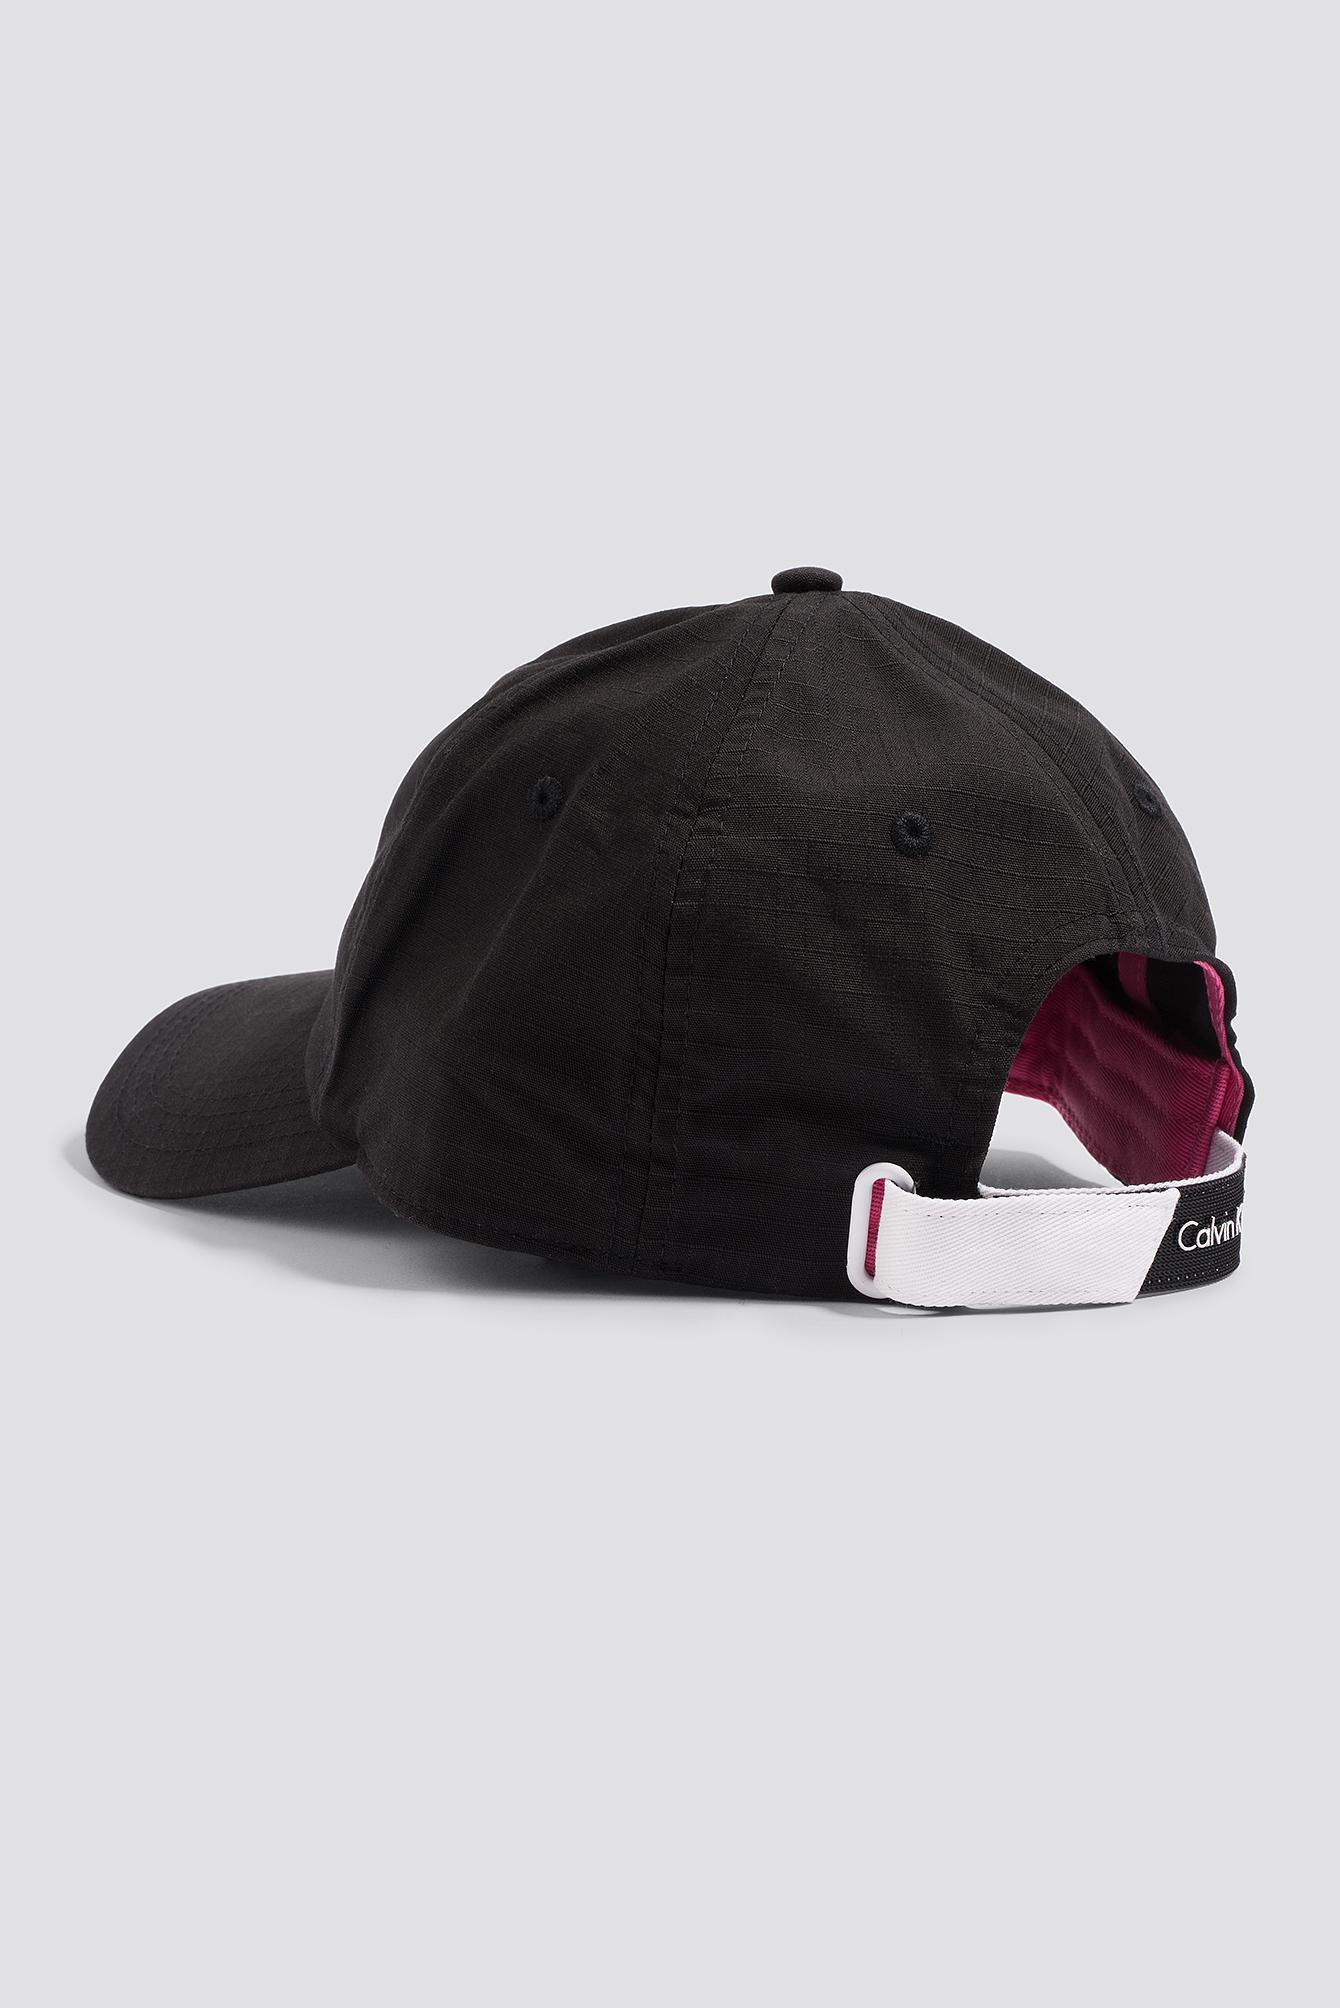 3ecdc5dc824 Lyst - Calvin Klein 1978 Baseball Cap Black in Black